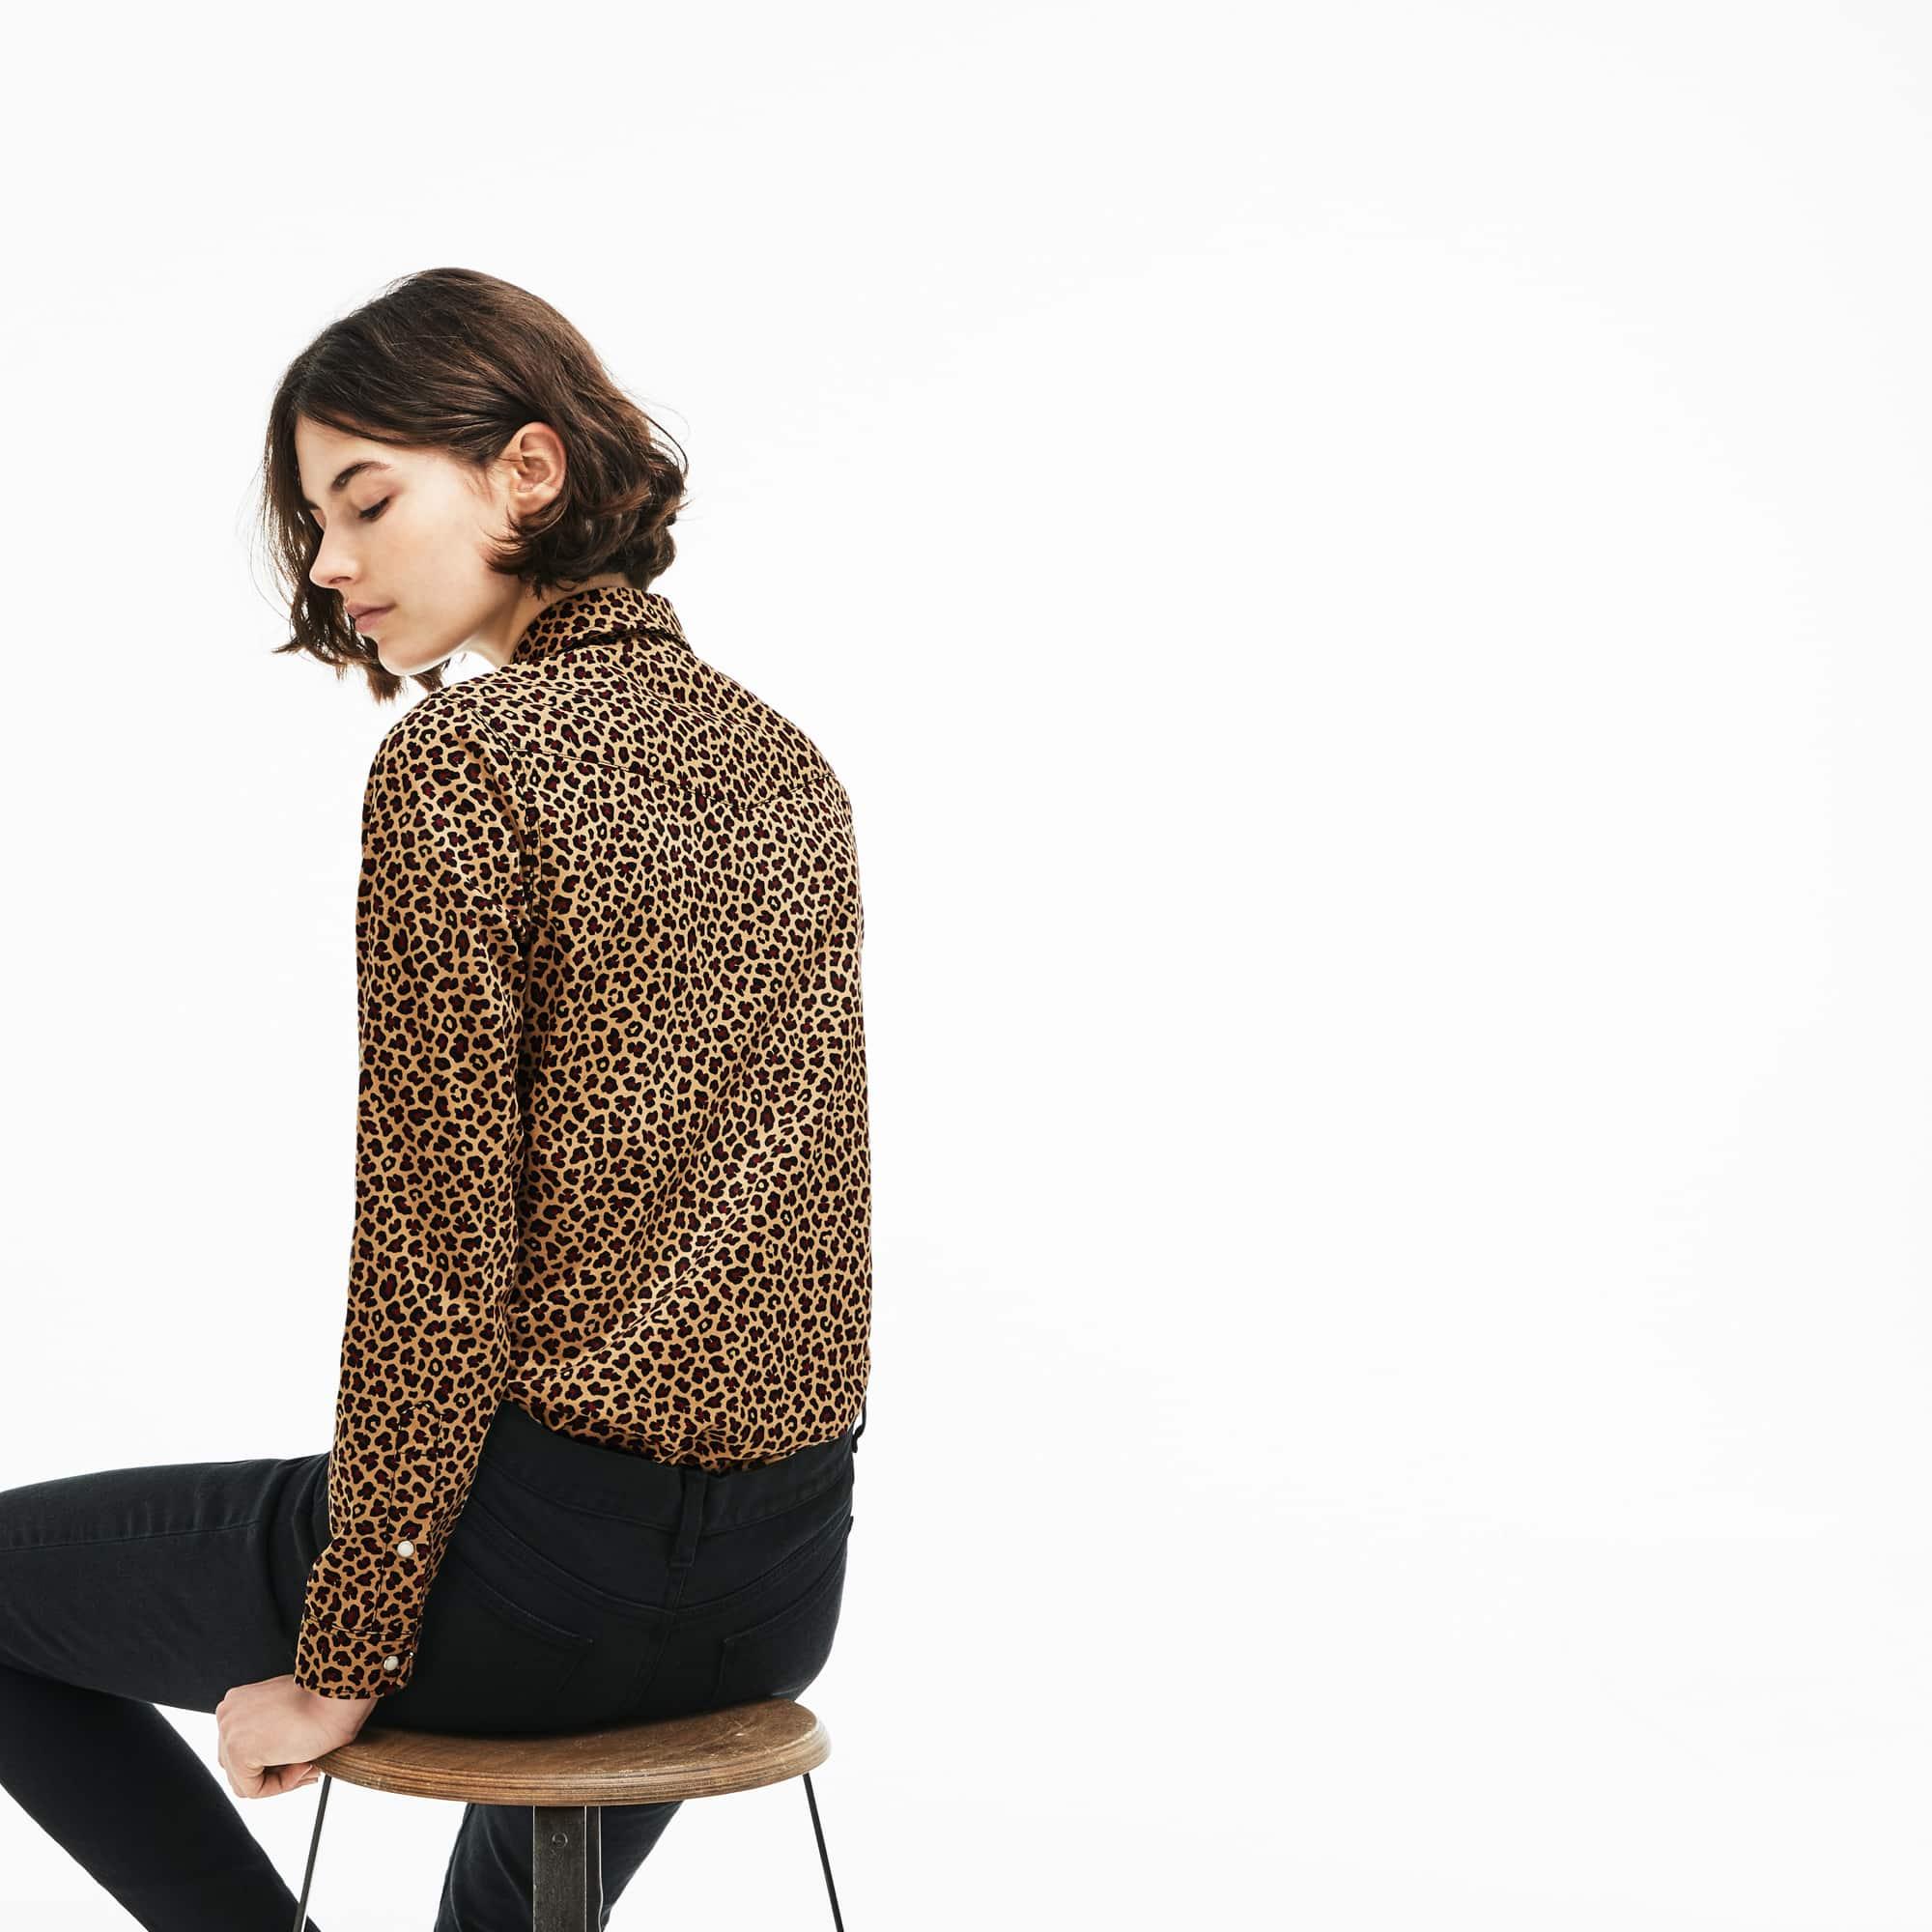 125ebe0525 Women's Lacoste LIVE Slim Fit Leopard Print Stretch Twill Shirt